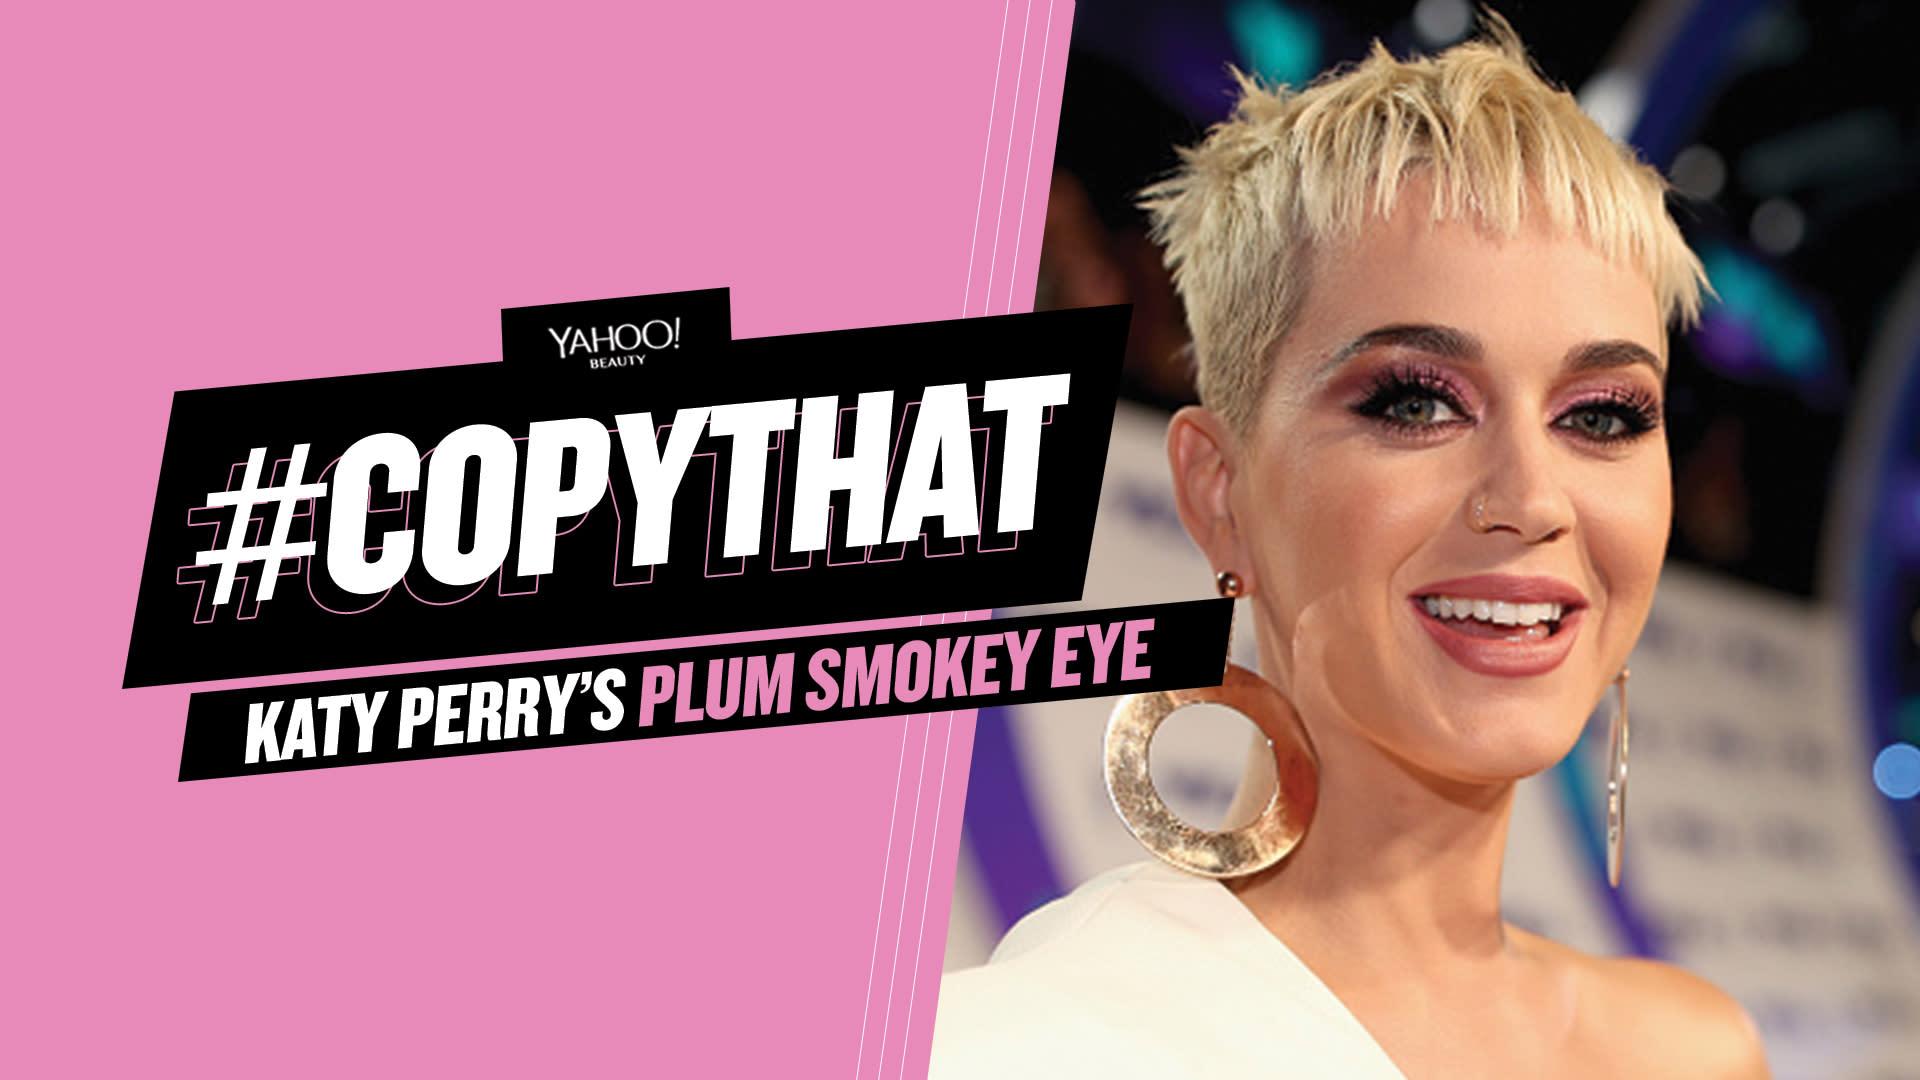 5dccf4fa090 Katy Perry's VMAs eye-color brightening trick [Video]